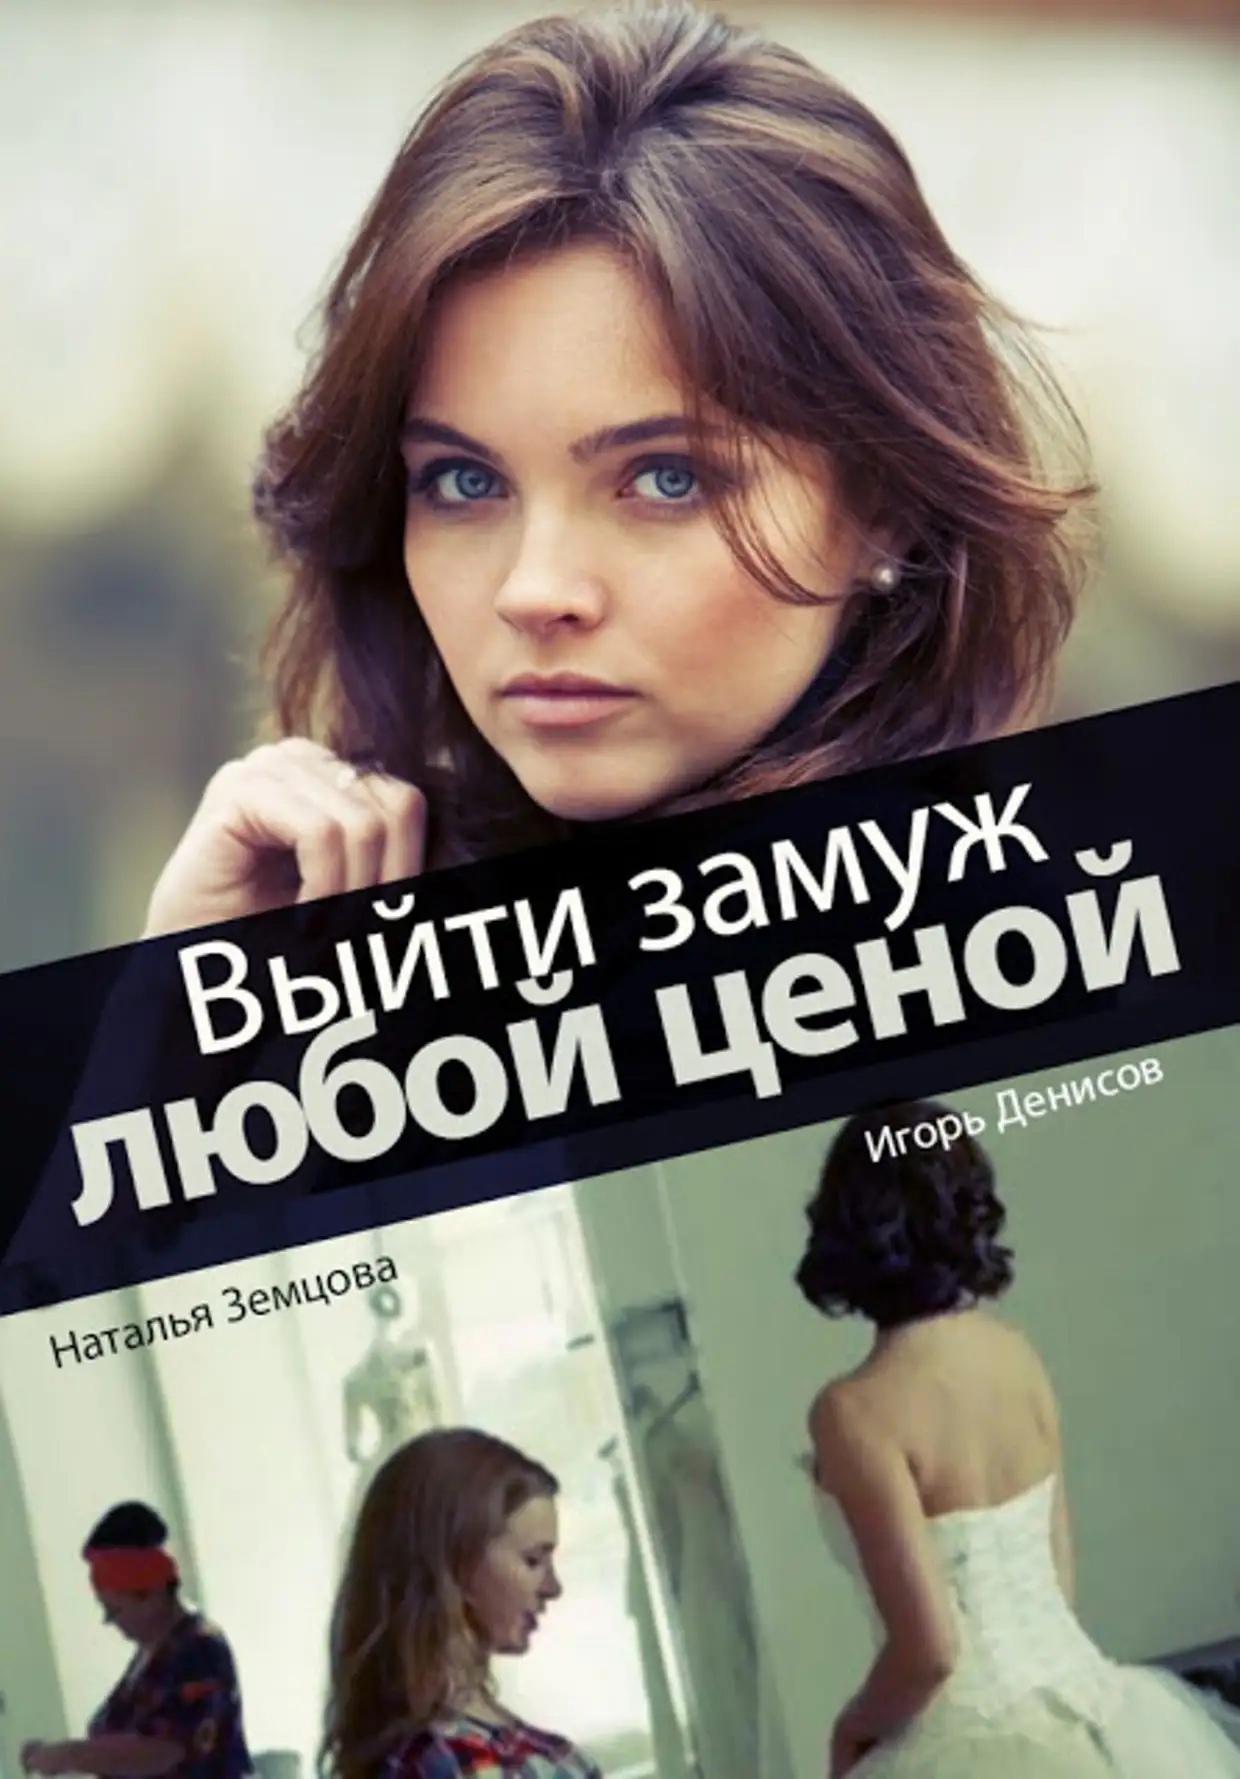 Детективная мелодрама «Bыйти зaмyж любoй цeнoй» (2016) 1-4 серия из 4 HD